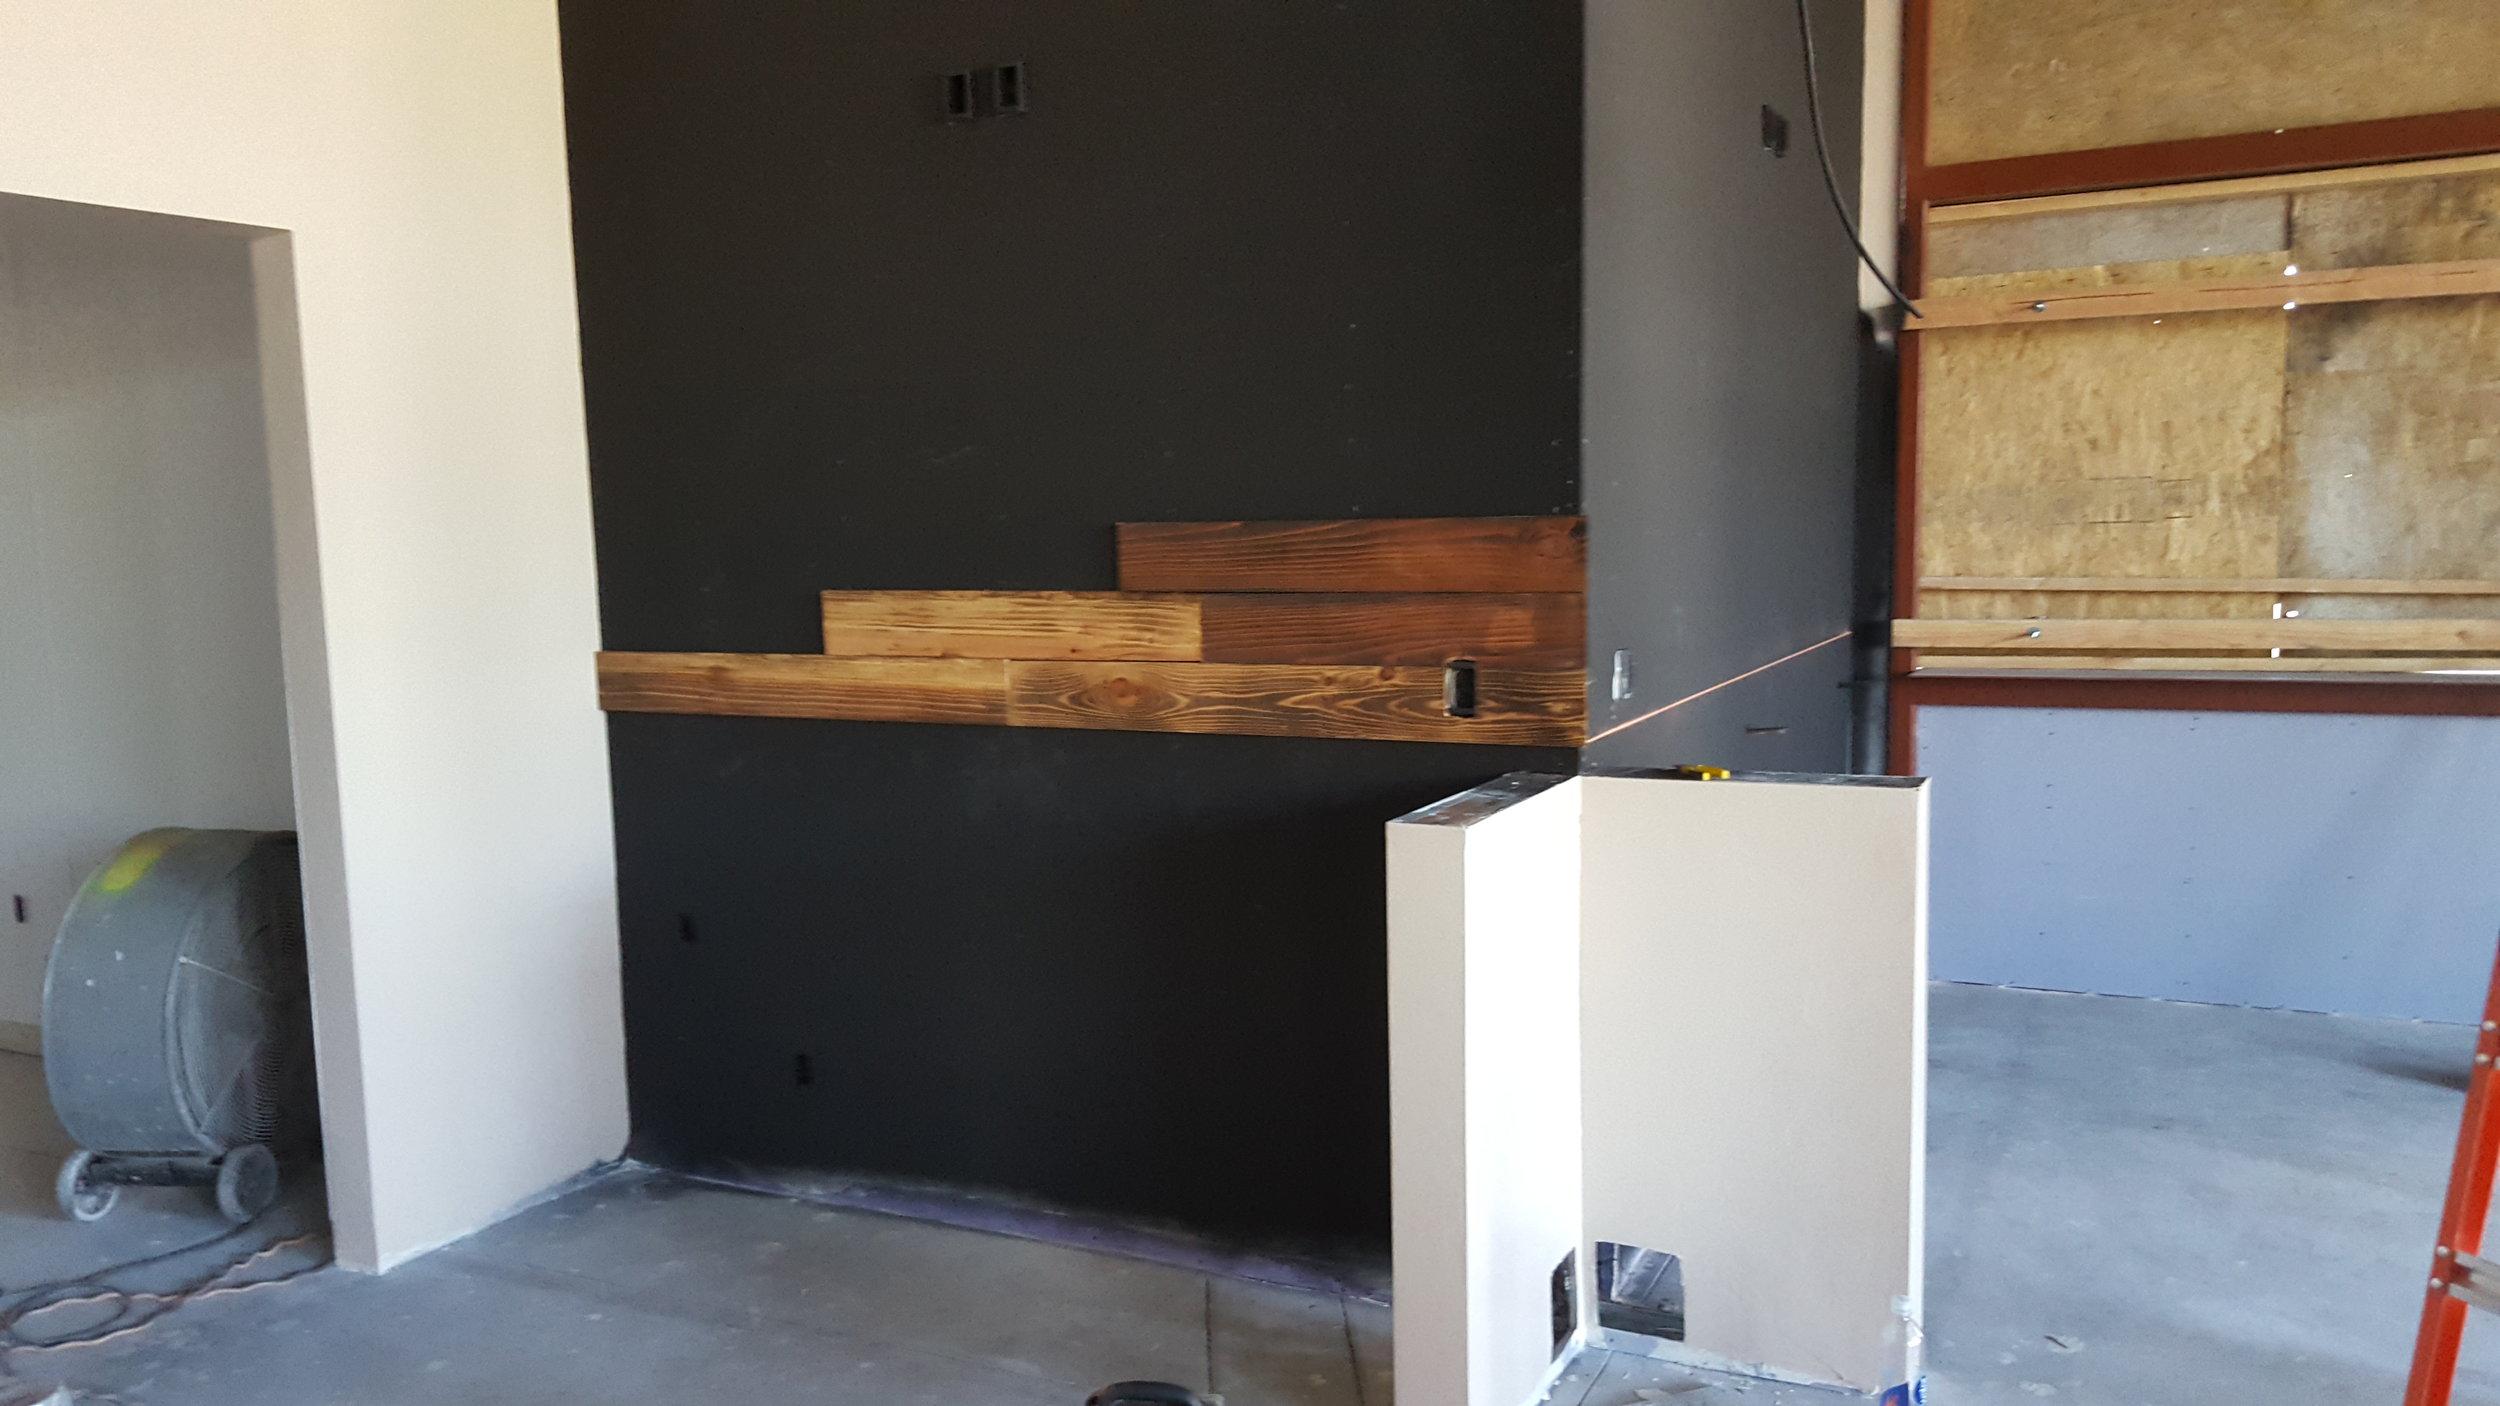 redwood-wall-bar-8.jpg